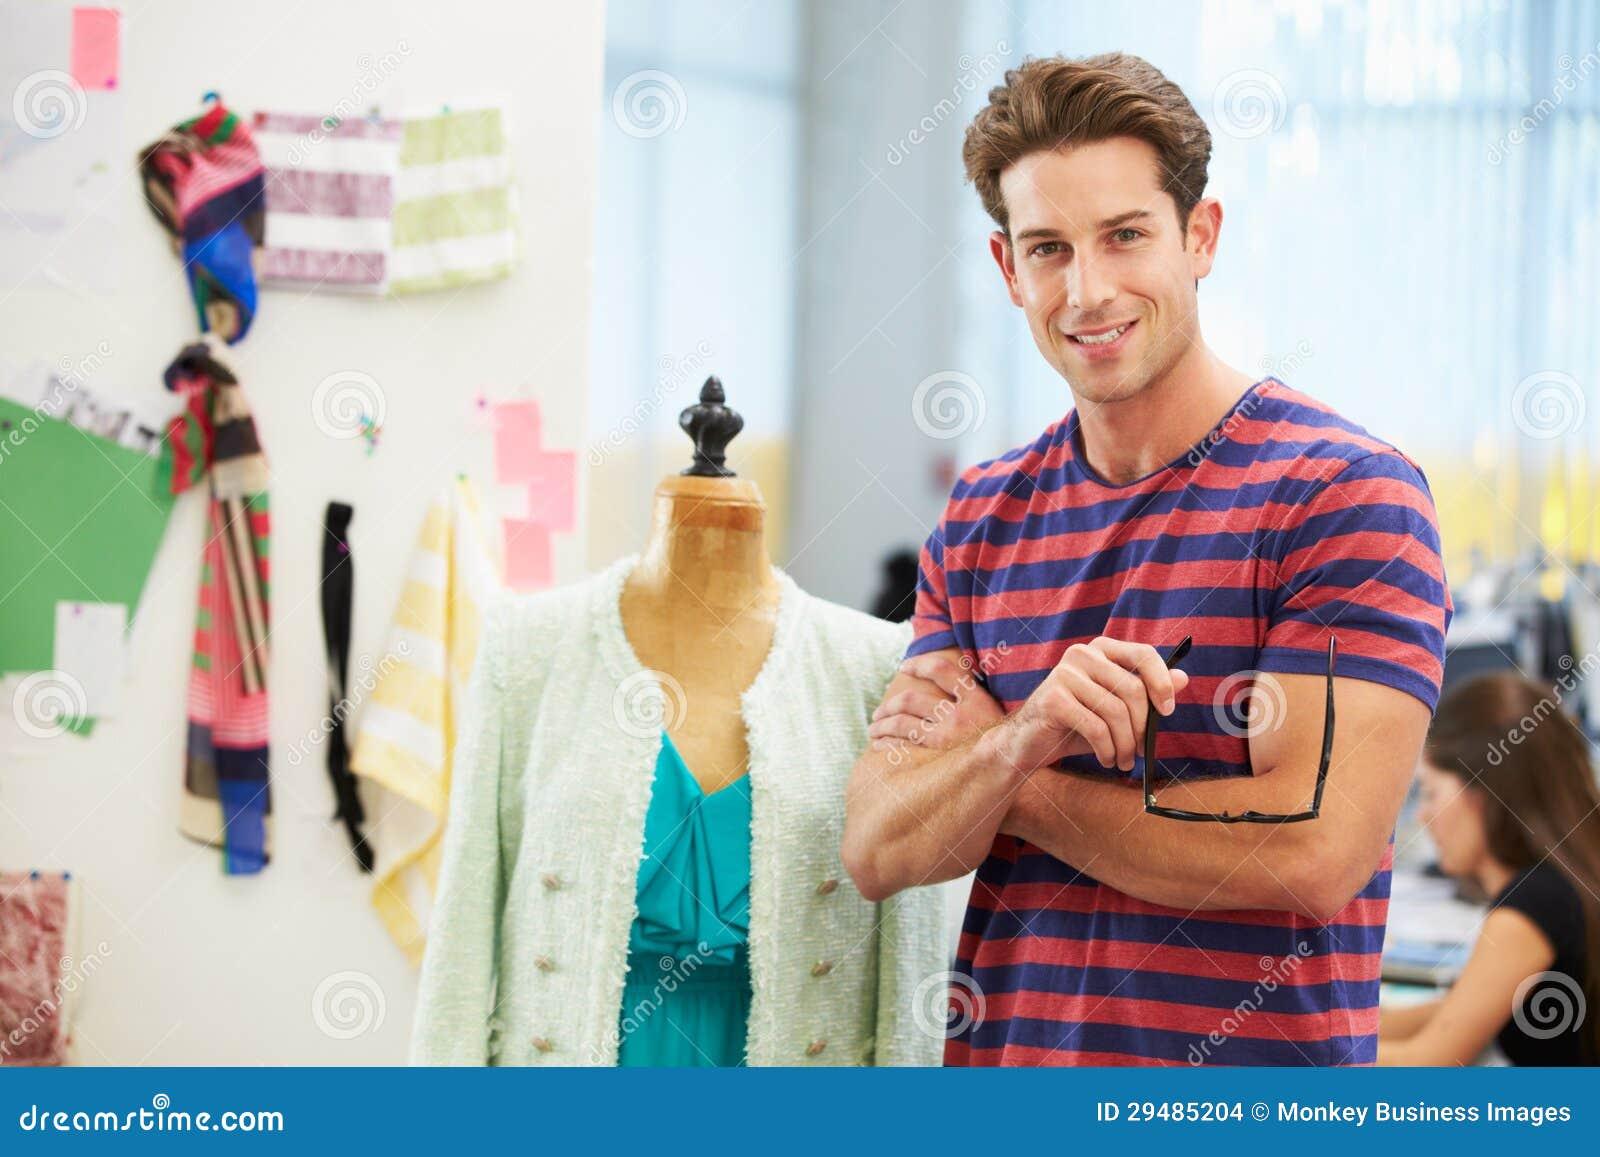 Male Fashion Designer In Studio Stock Images - Image: 29485204